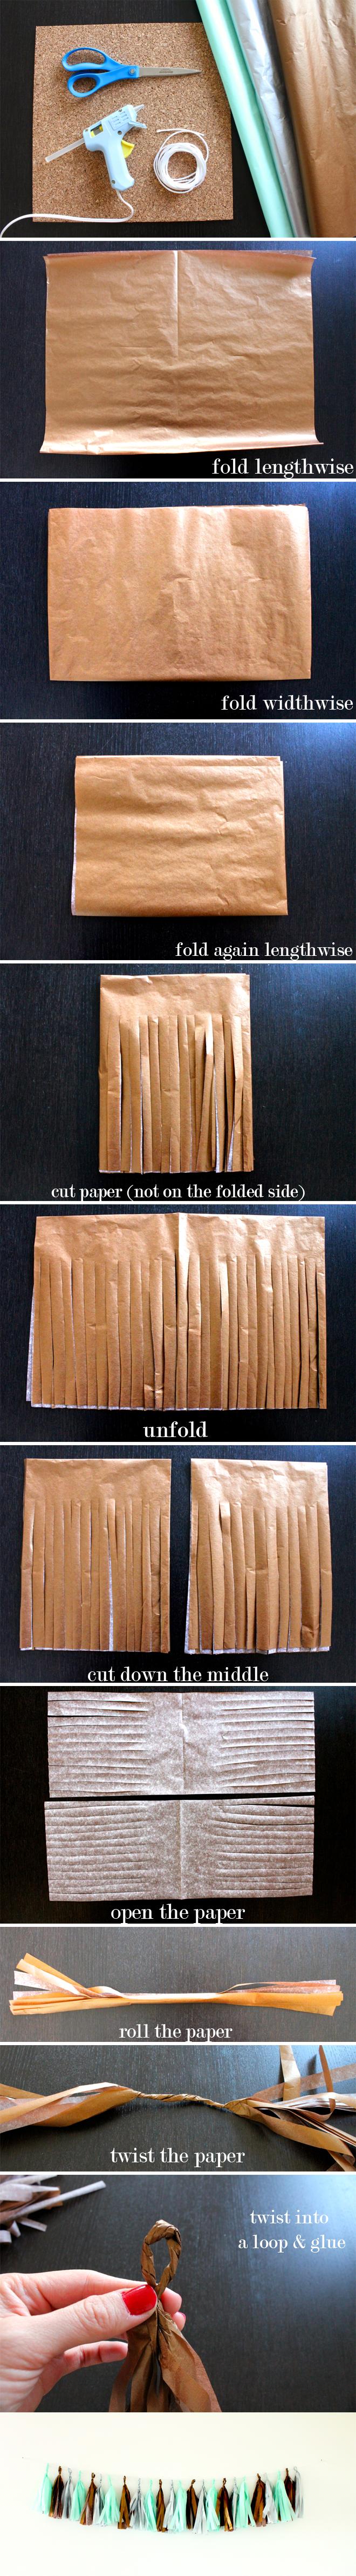 How to make a Tissue Paper Tassel Garland!